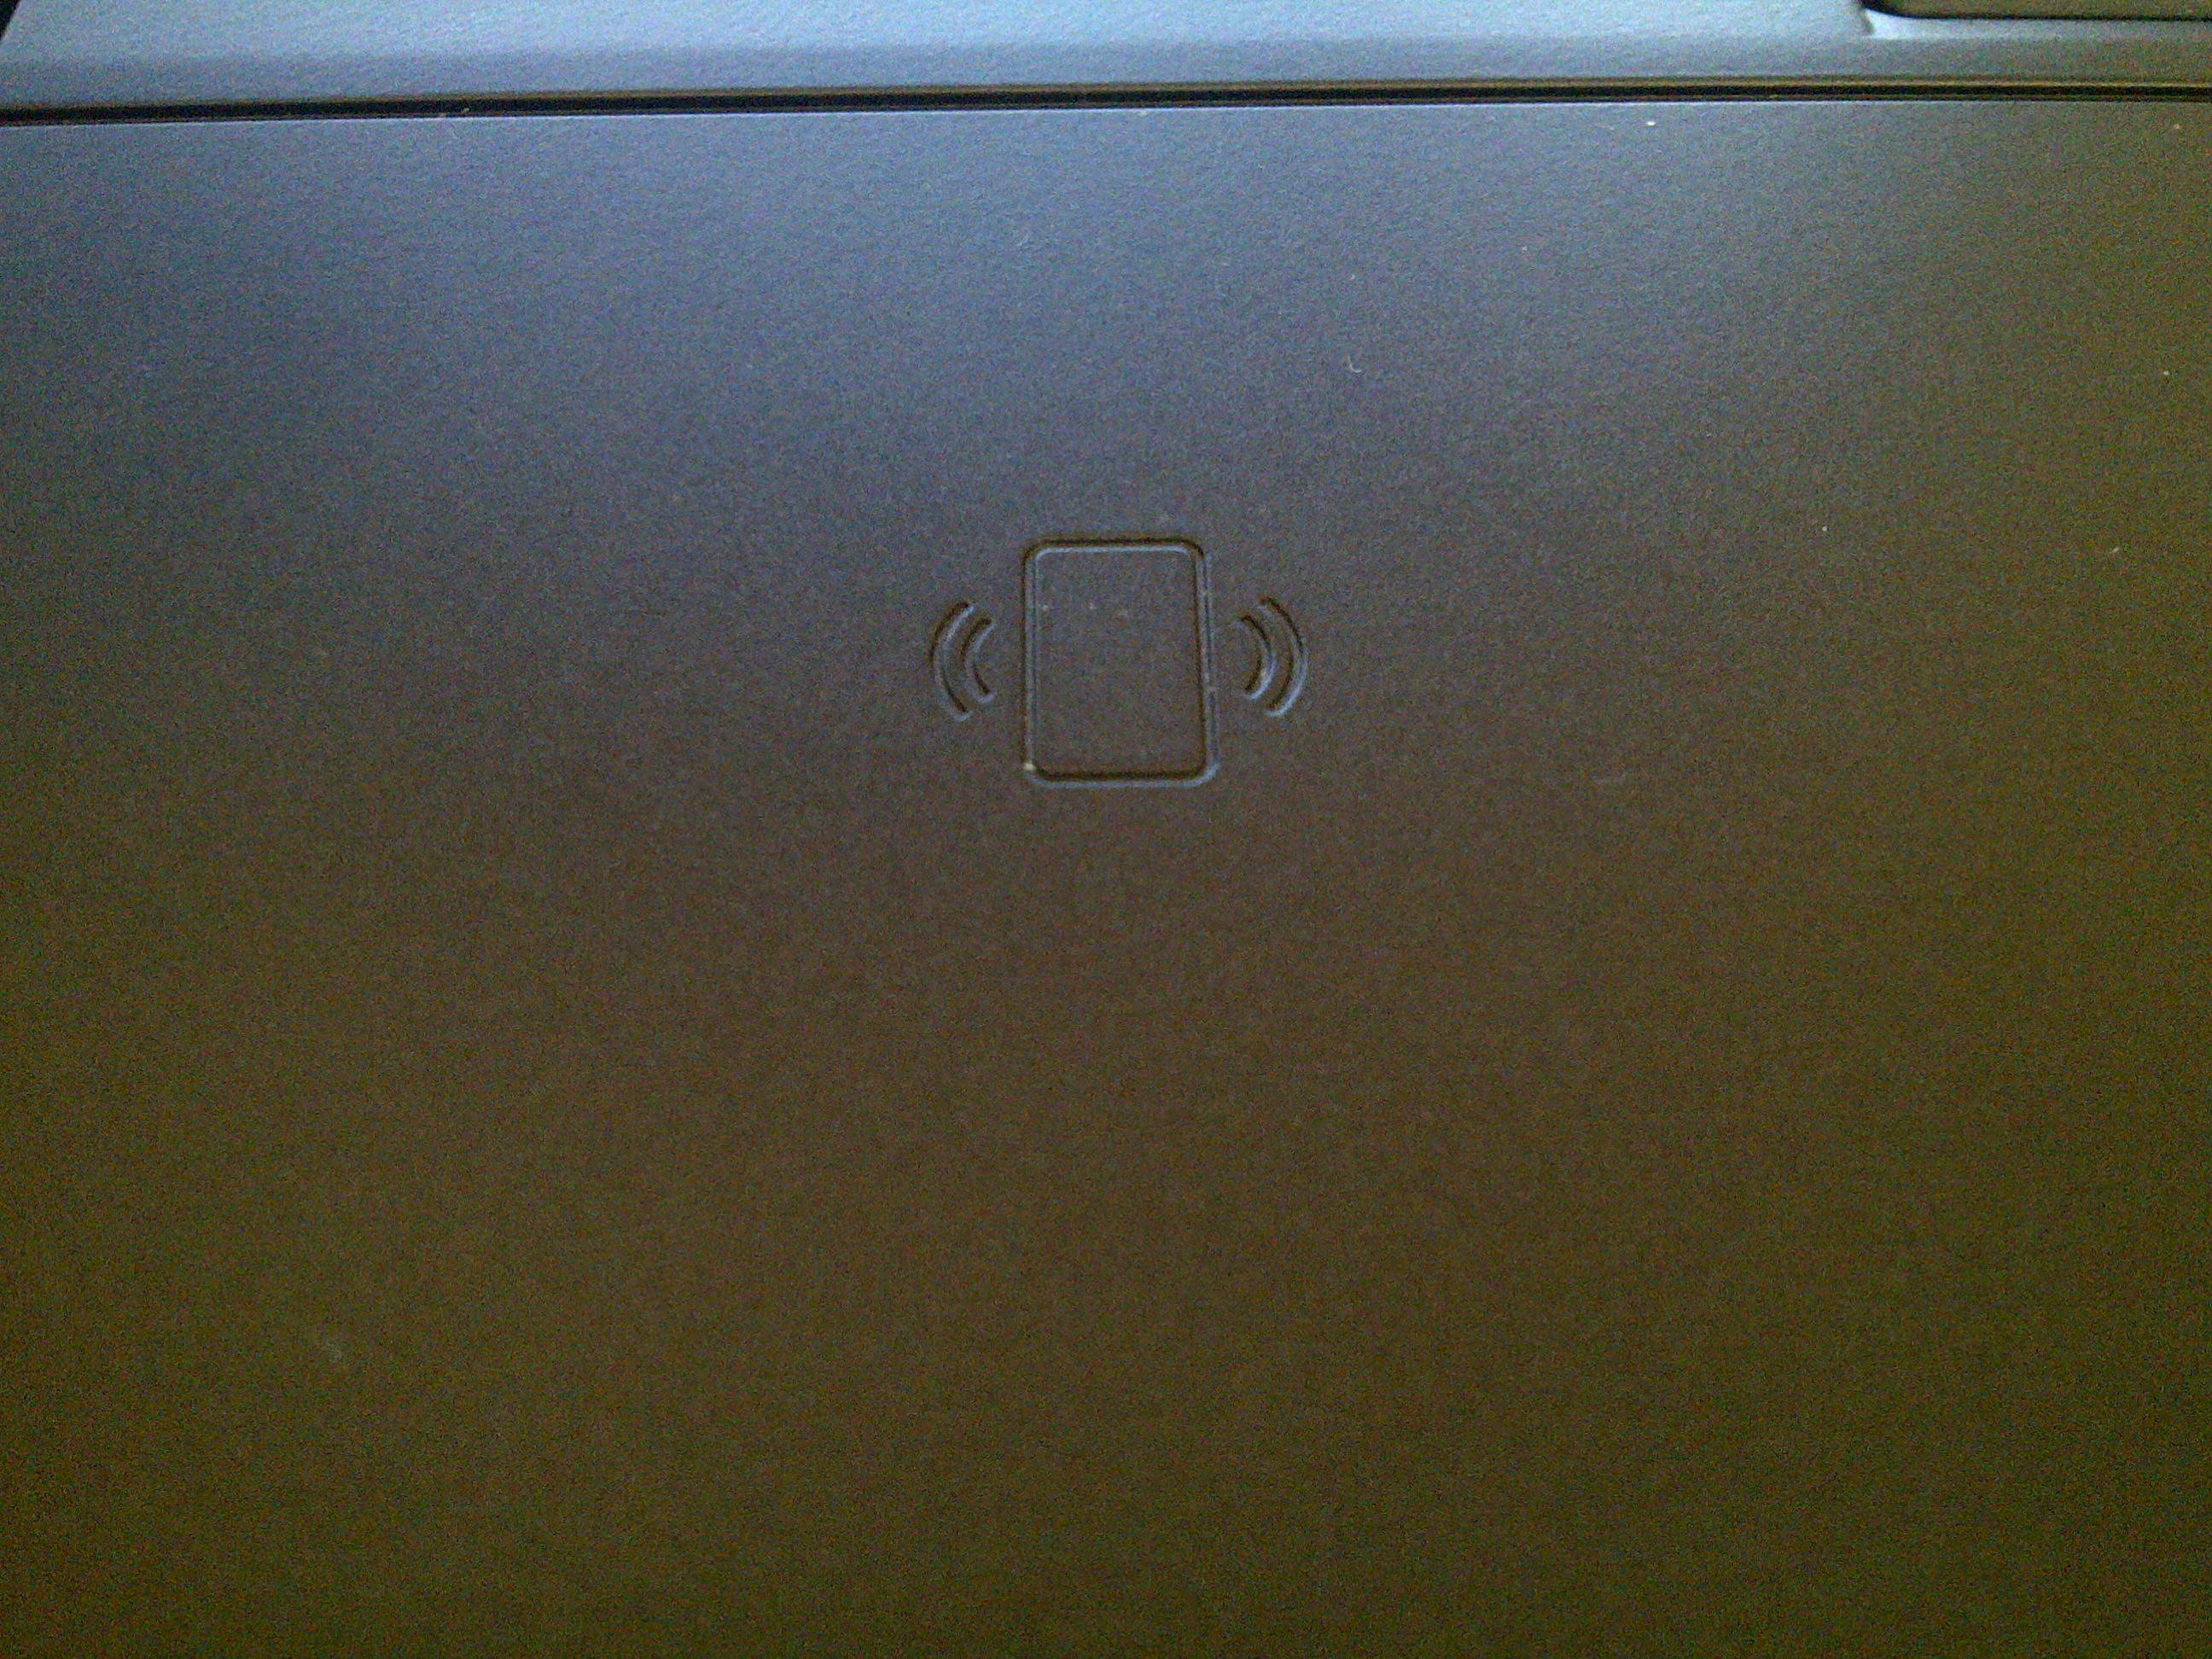 File:RFID reader location on a Dell e6410 jpg - Wikimedia